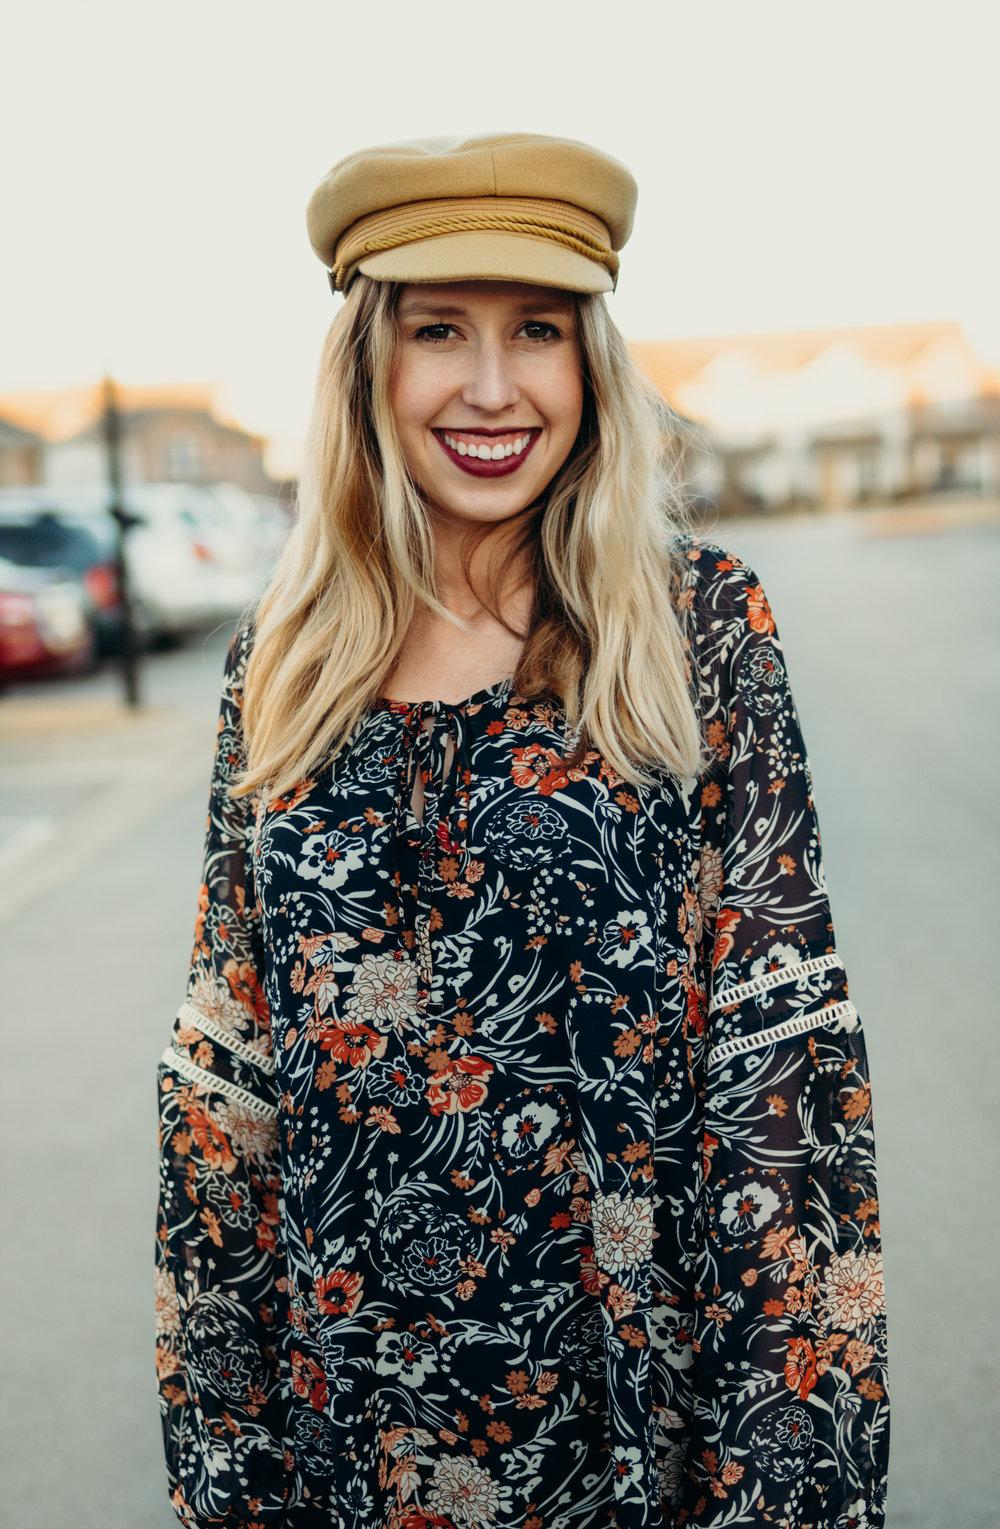 IvyBridge Dress | The Simplistic Chic